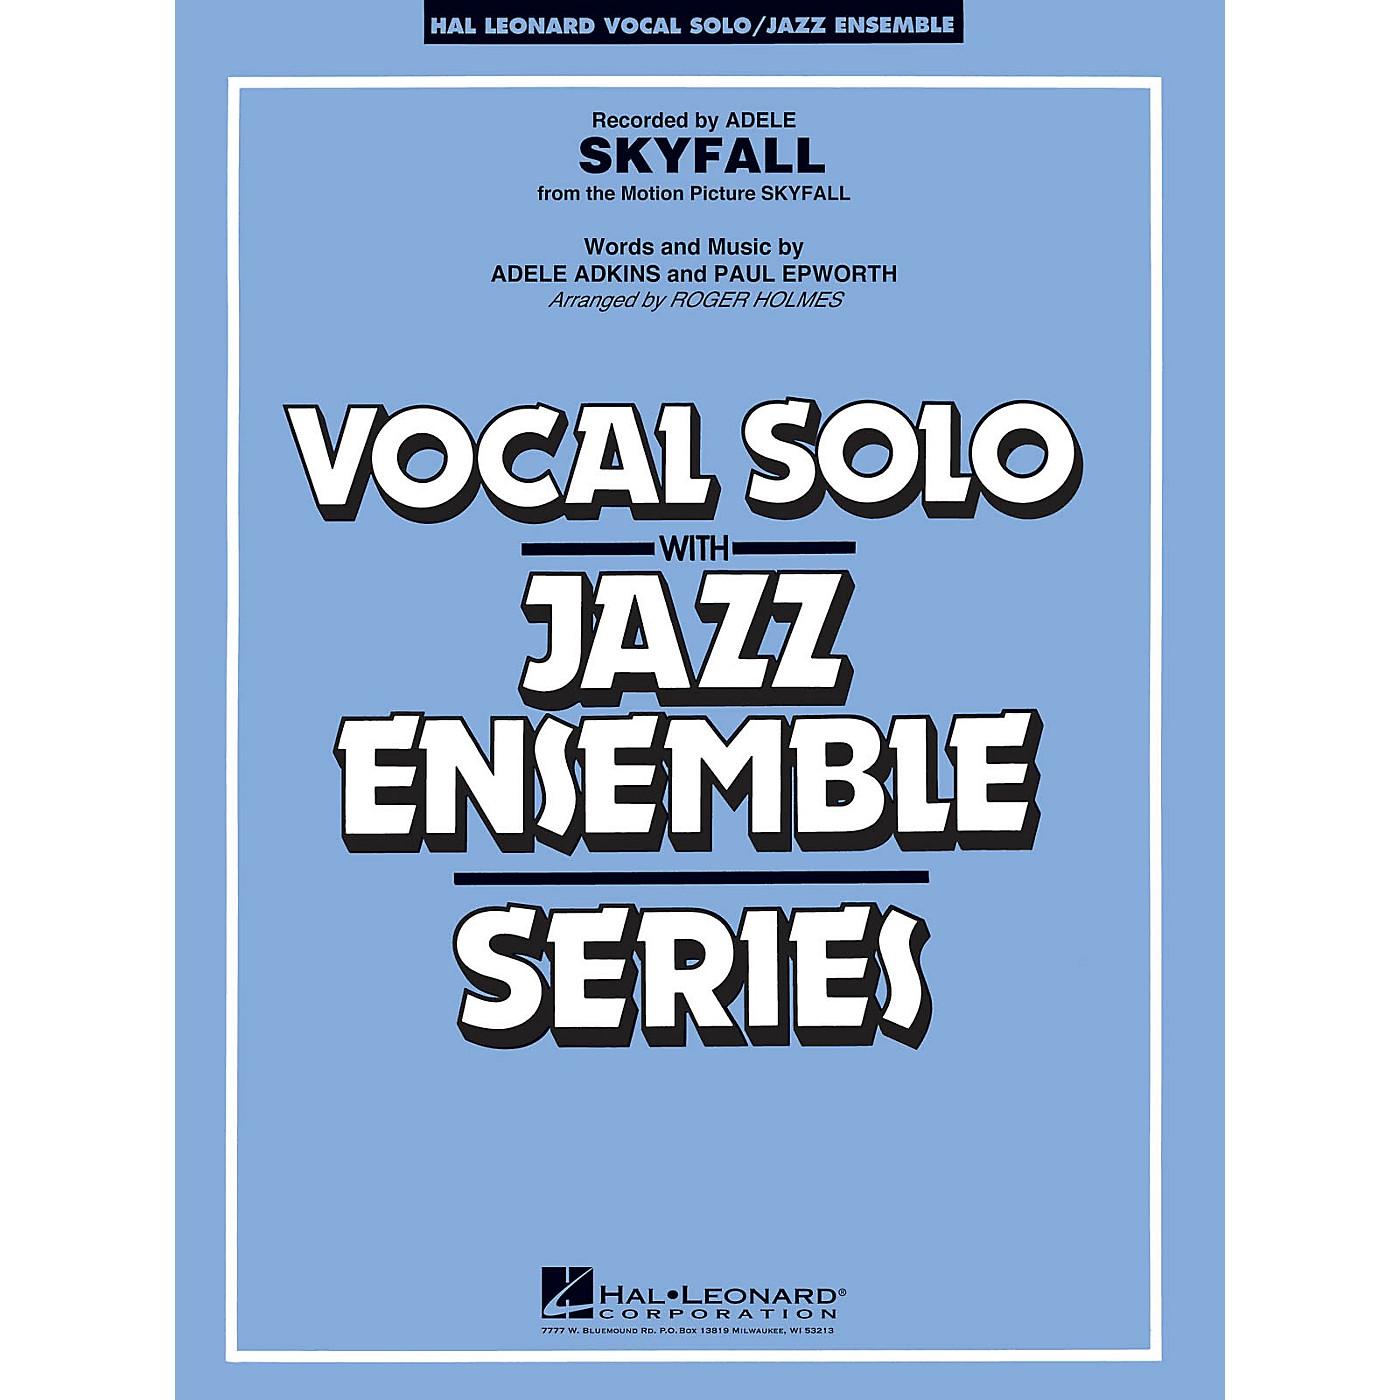 Hal Leonard Skyfall (Key: Cmi) Jazz Band Level 3-4 by Adele Arranged by Roger Holmes thumbnail